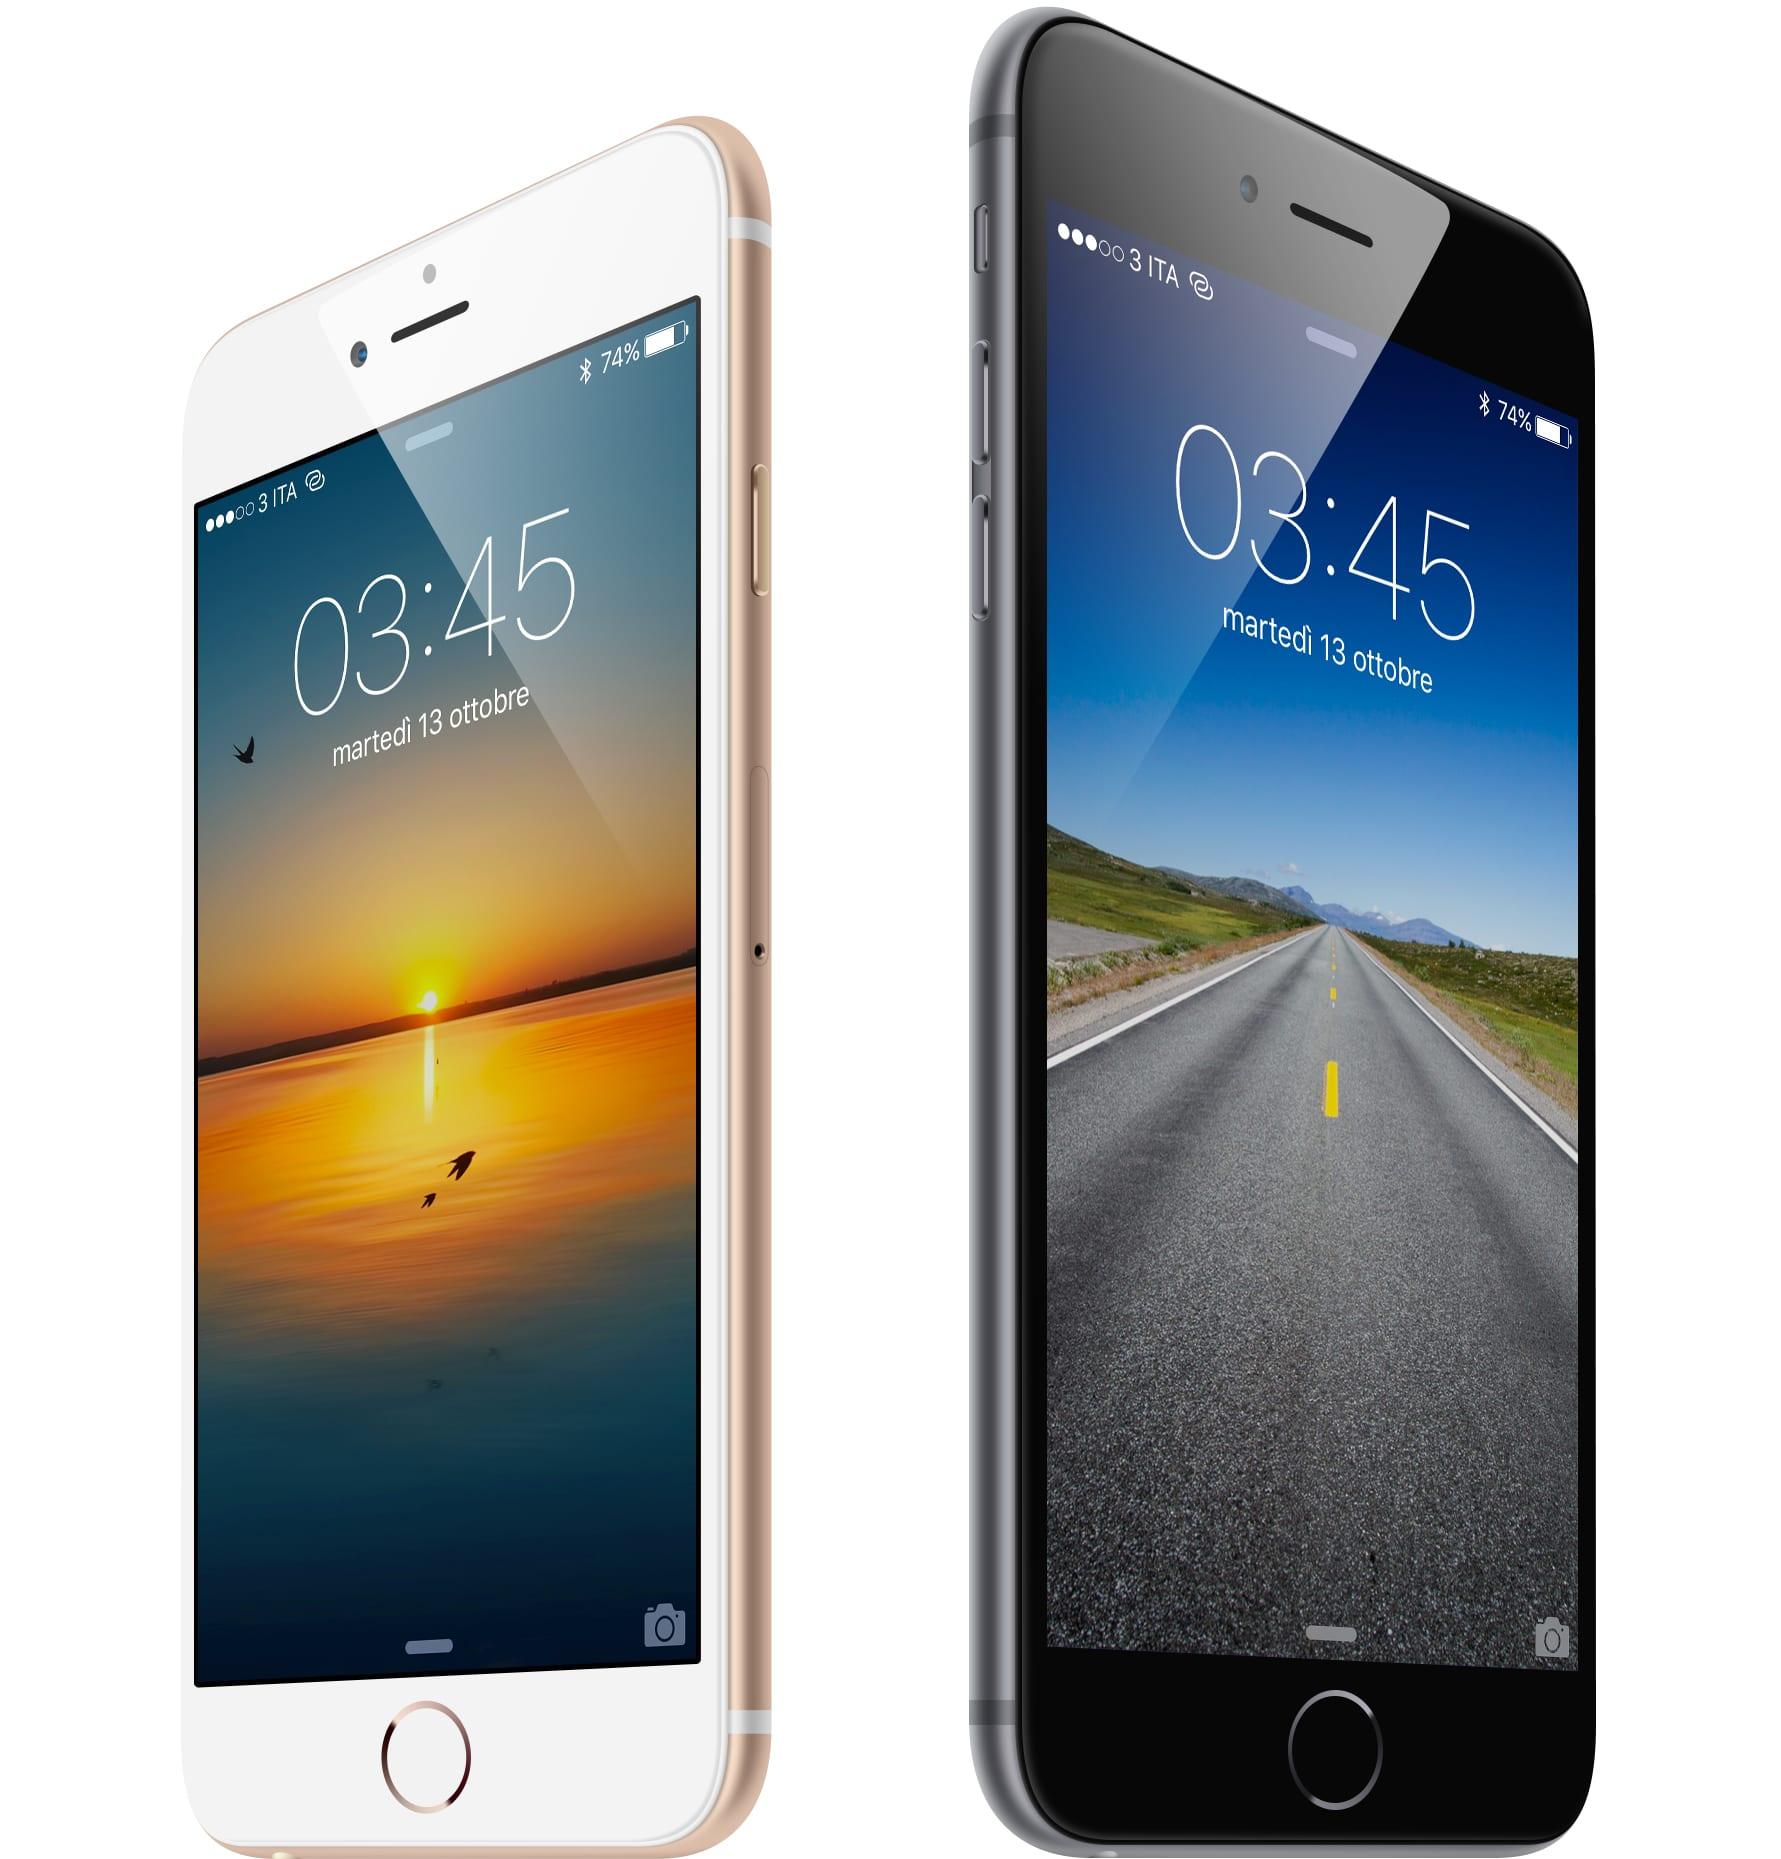 #WallpaperSelection #88: Scarica Gratis i nuovi Sfondi di iSpazio per iPhone, iPad ed Apple Watch